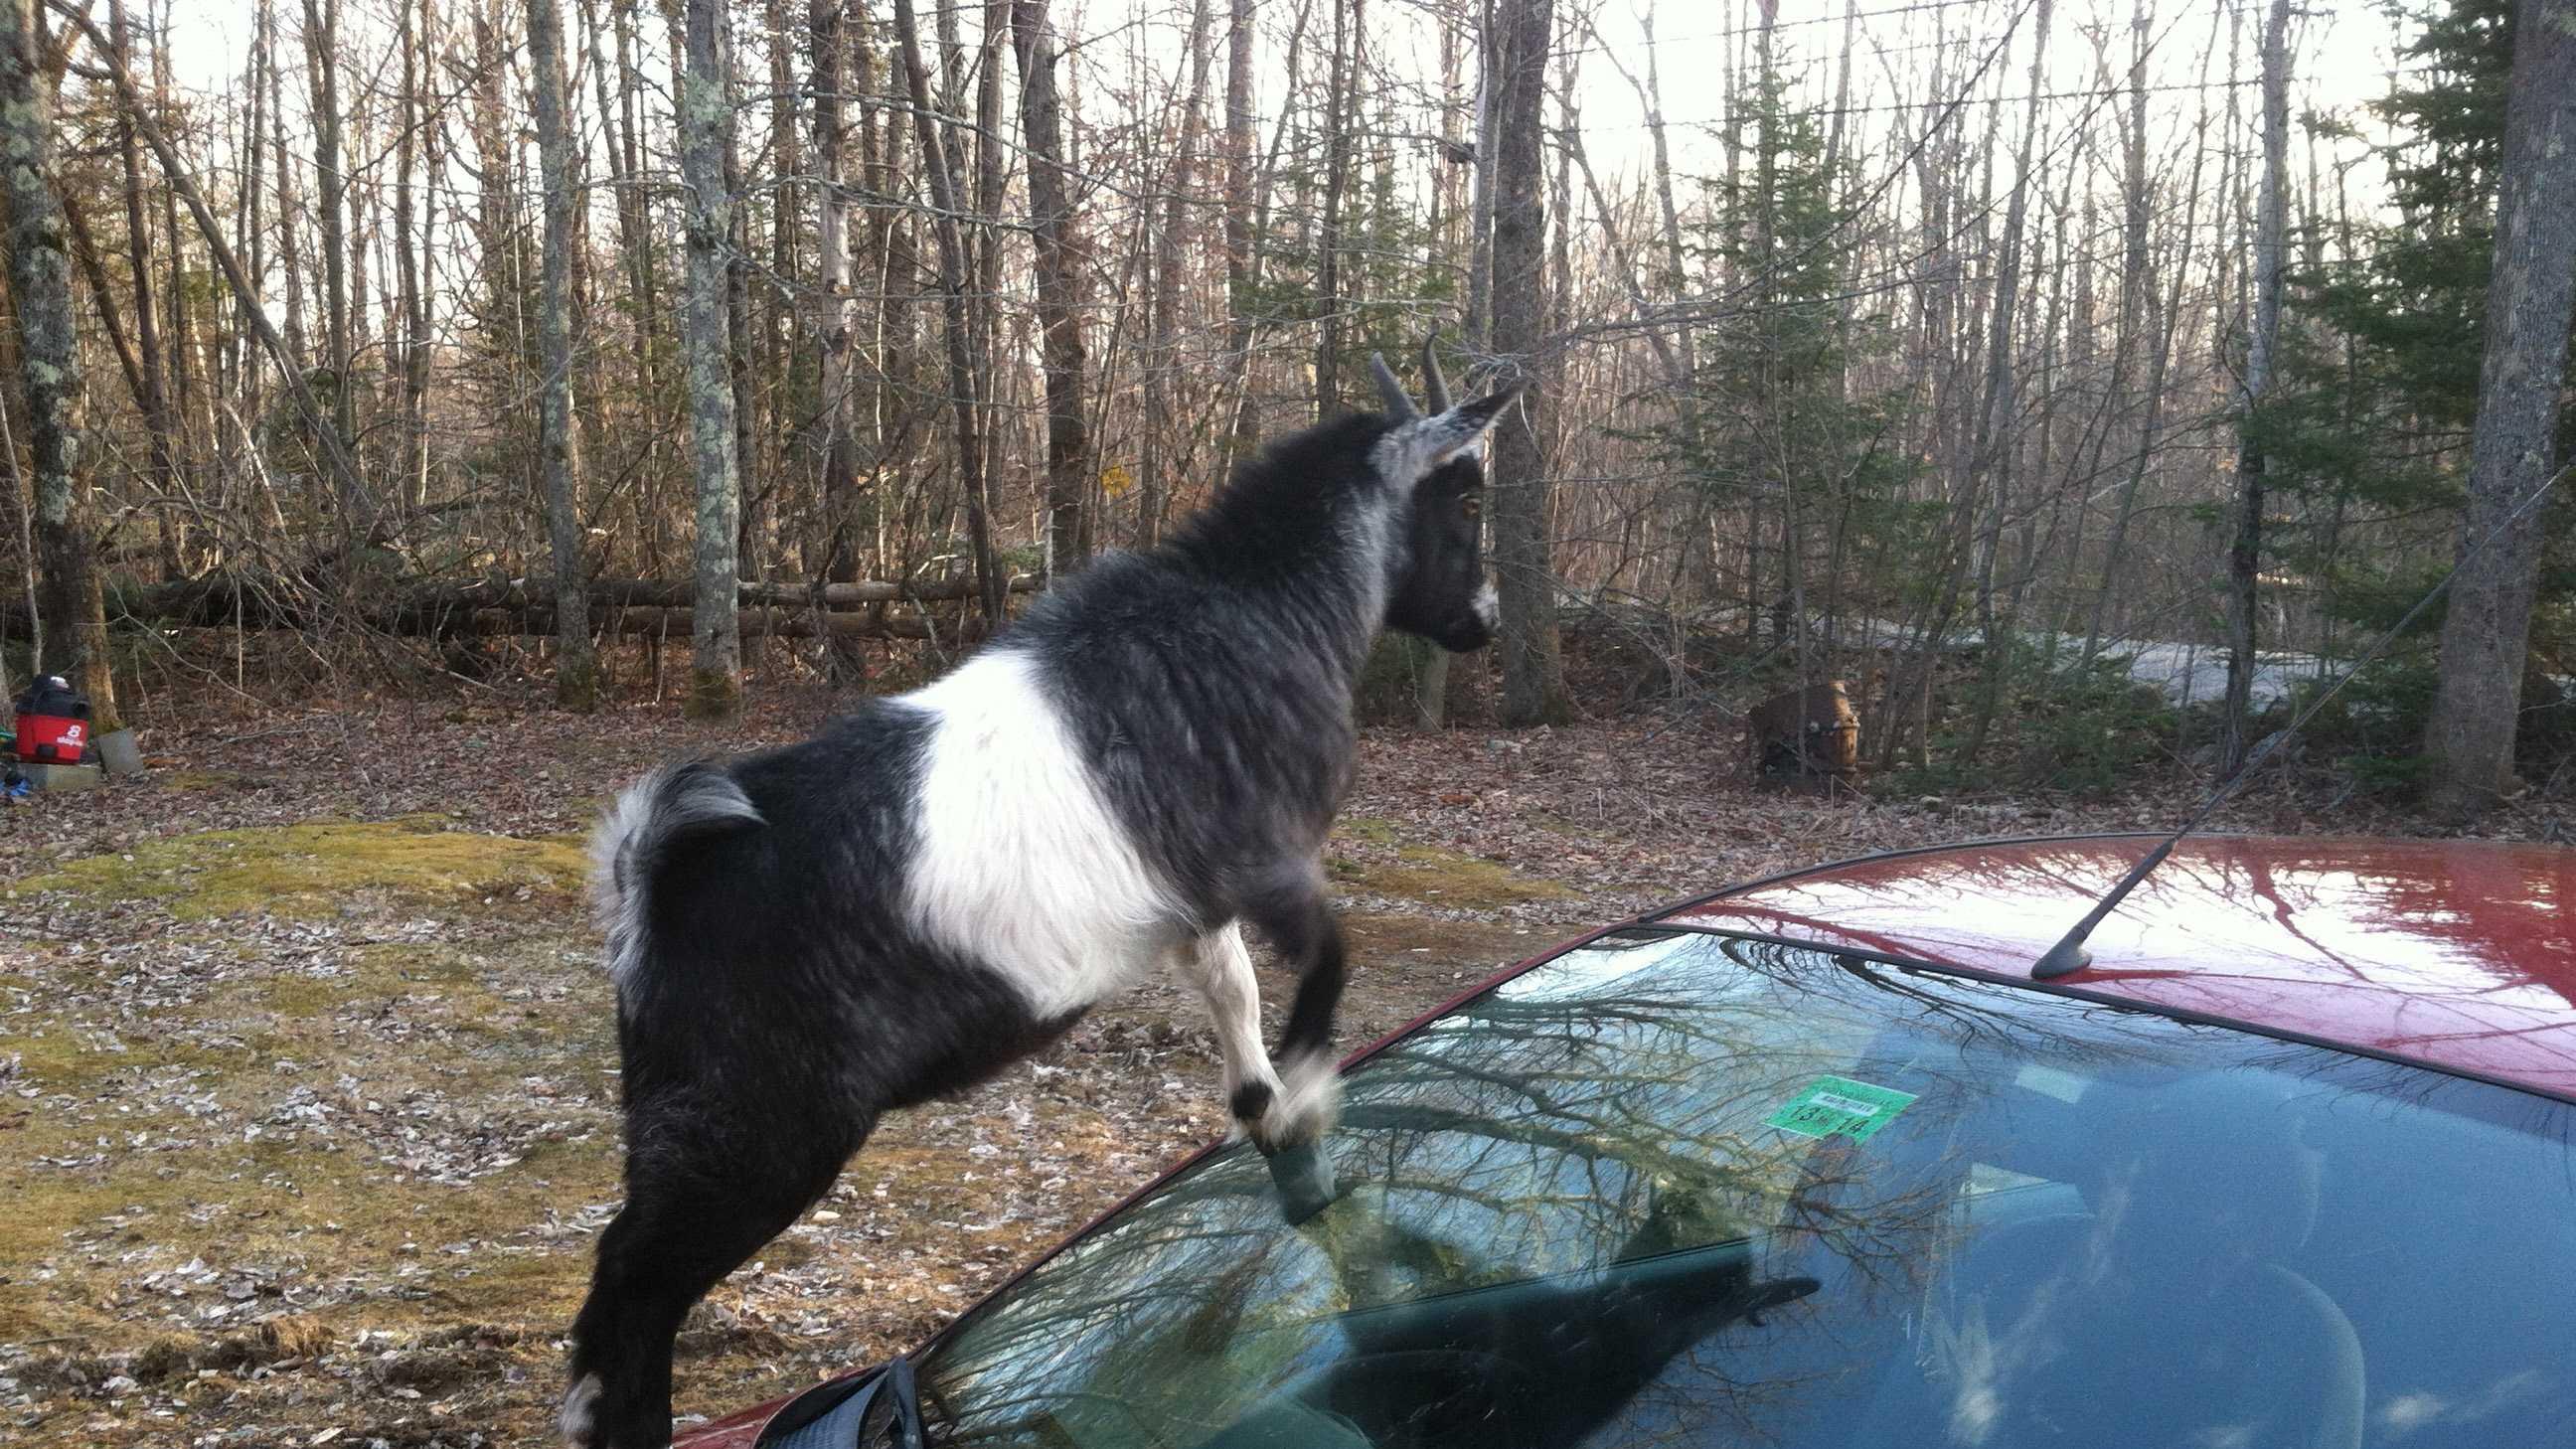 Richmond goat